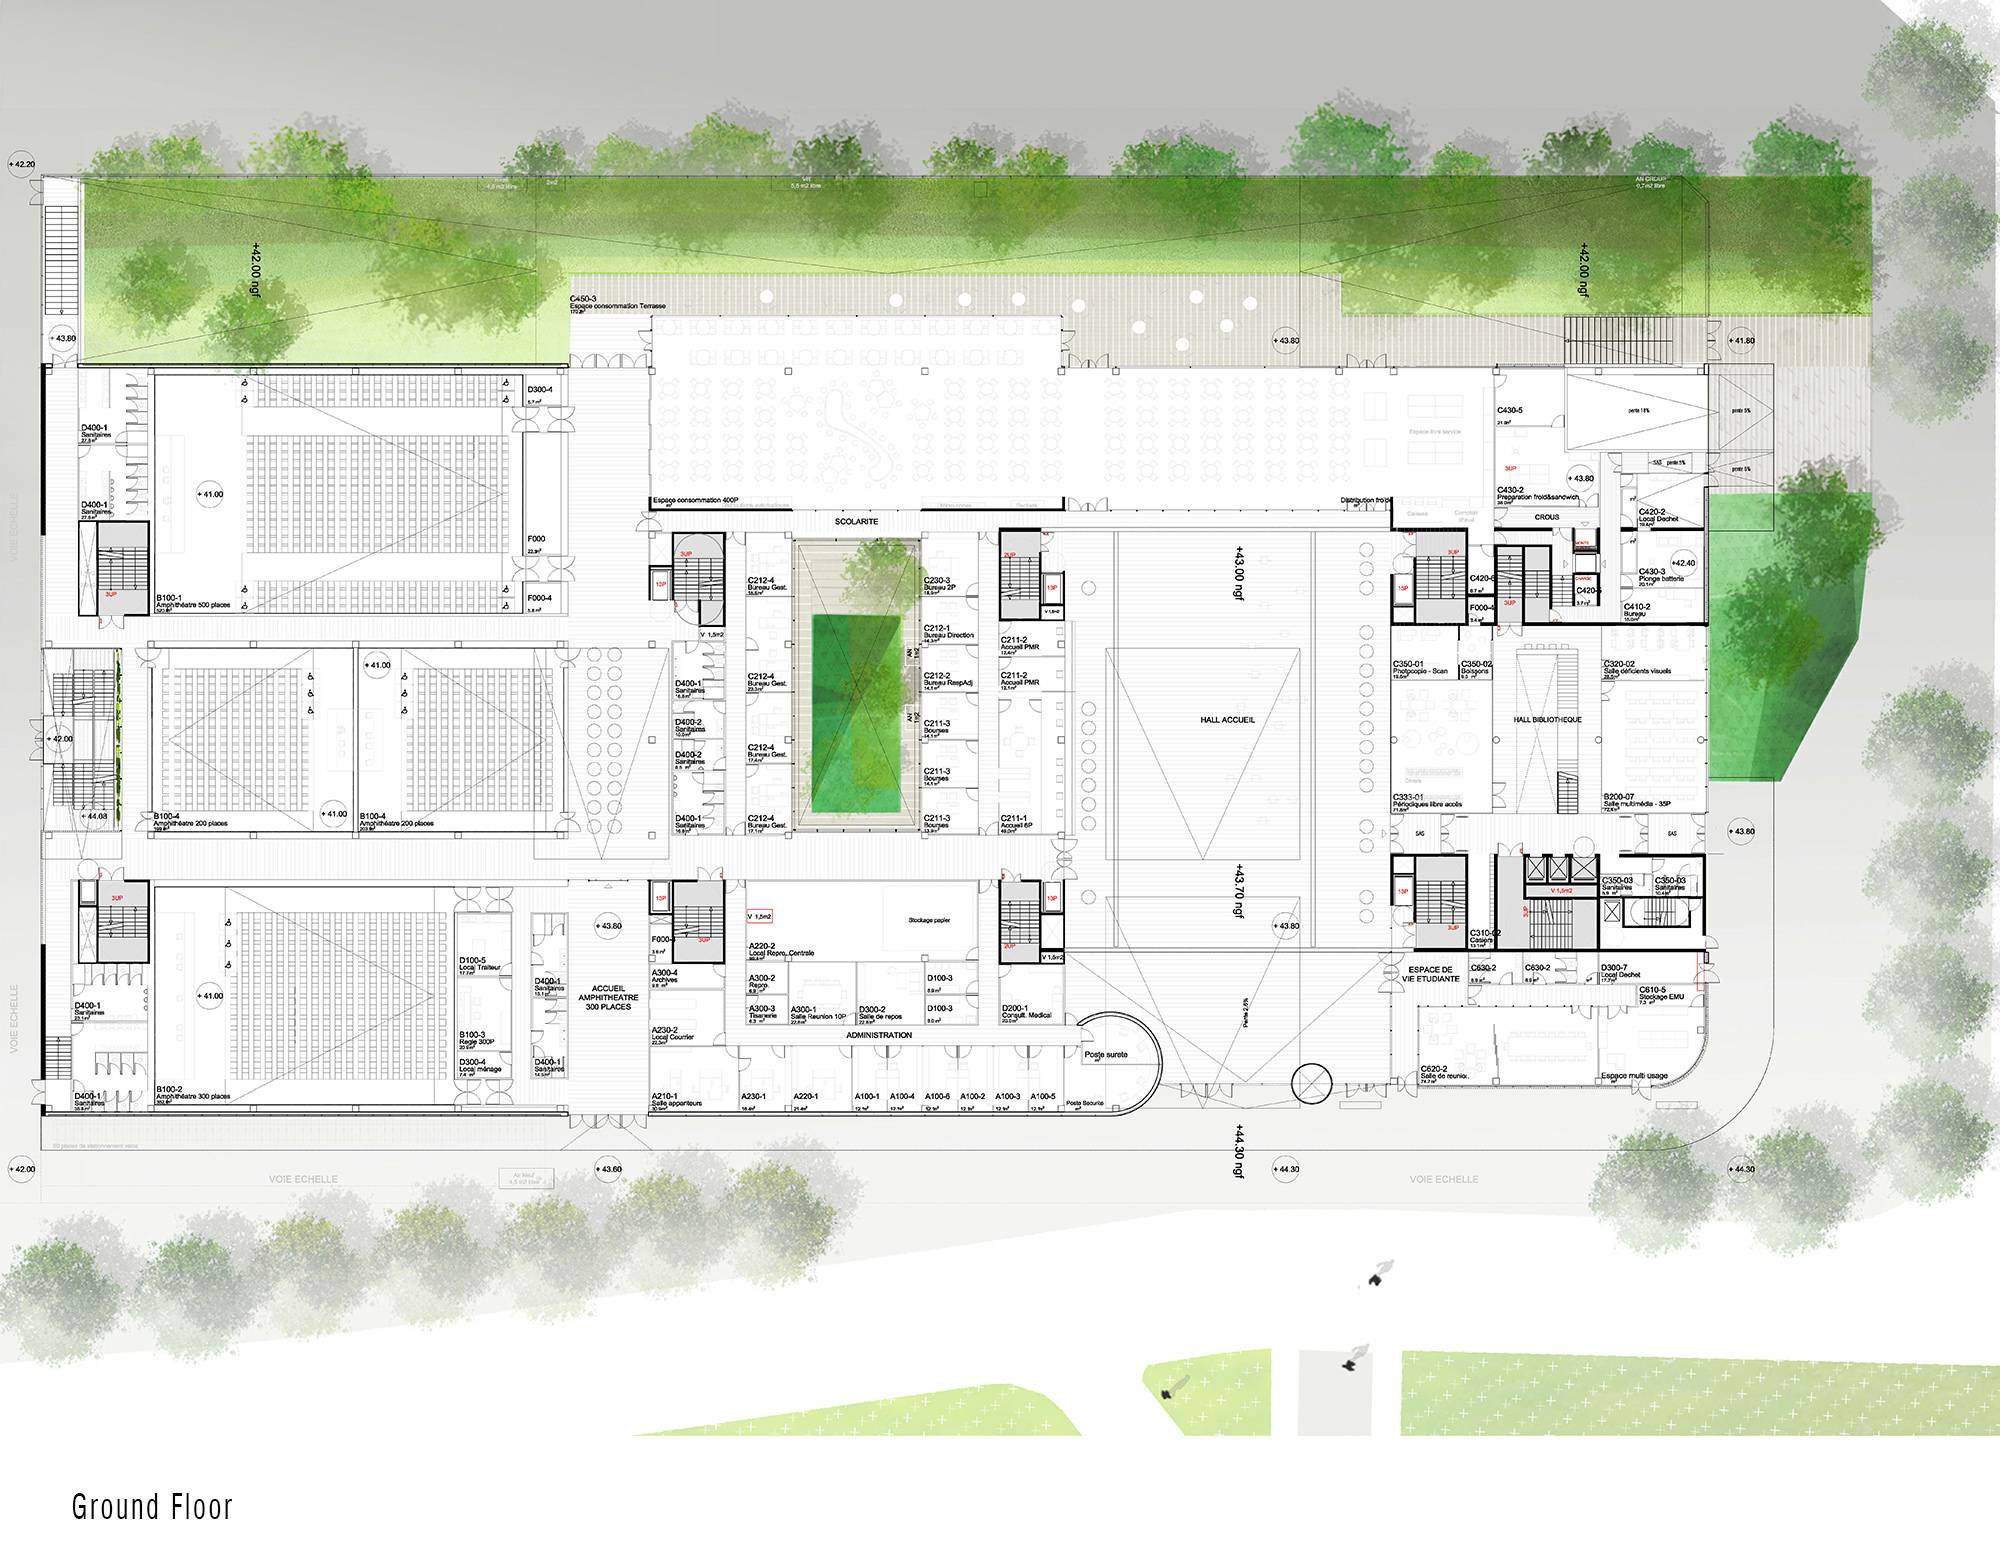 Ground Floor - Condorcet Campus - Josep Lluís Mateo